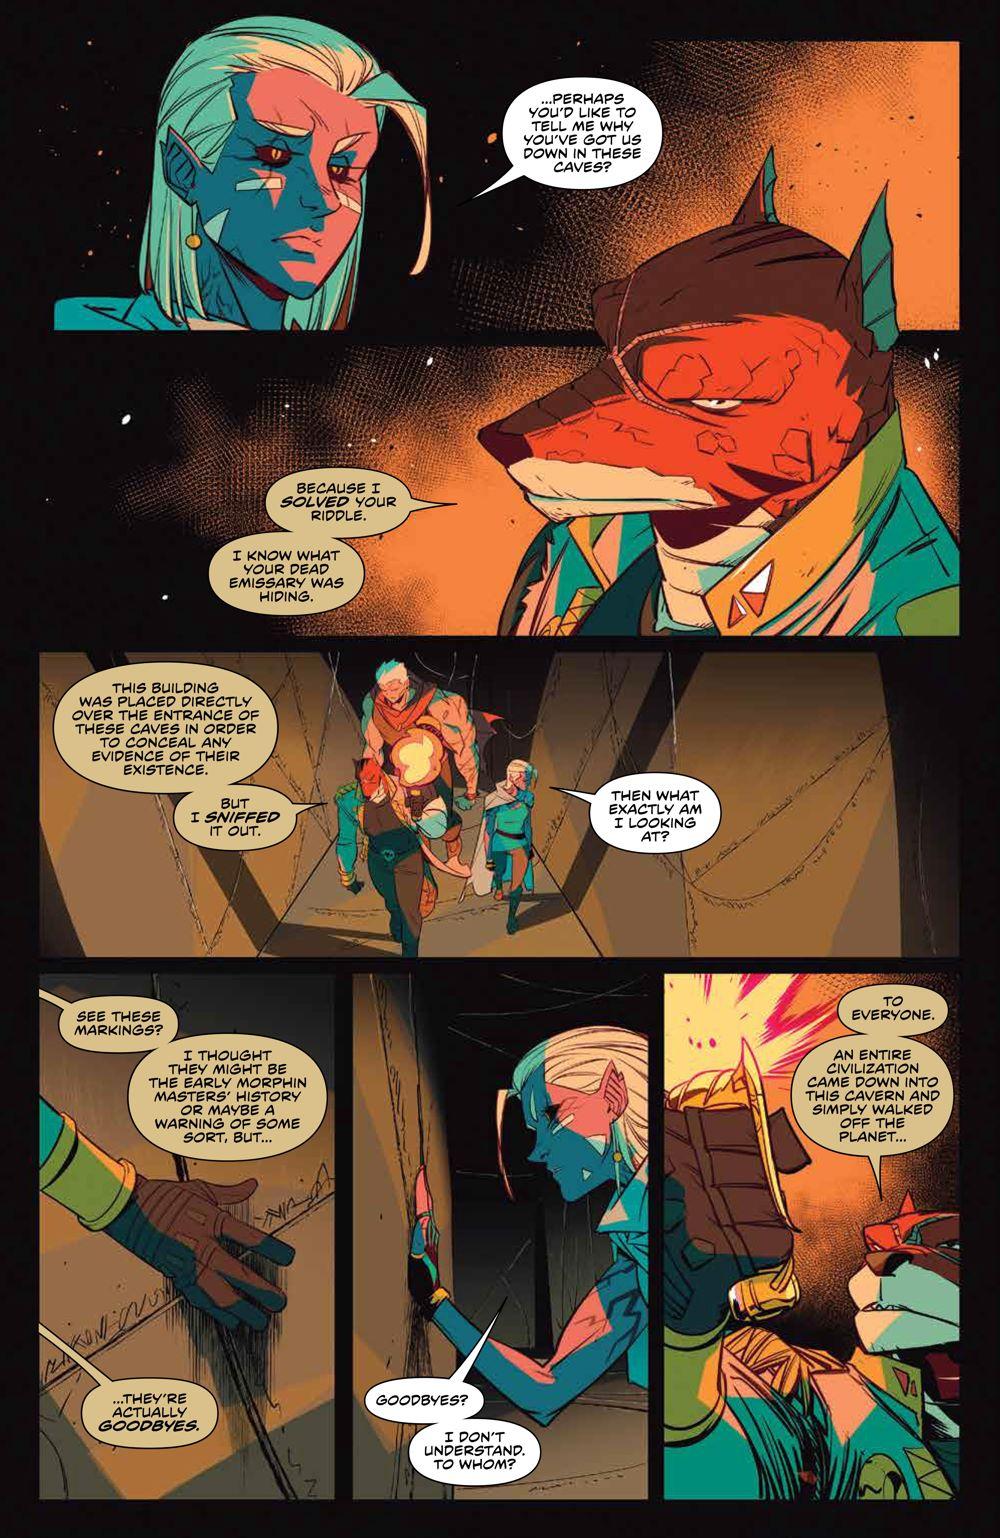 MMPR_v13_SC_PRESS_9 ComicList Previews: MIGHTY MORPHIN POWER RANGERS VOLUME 13 TP